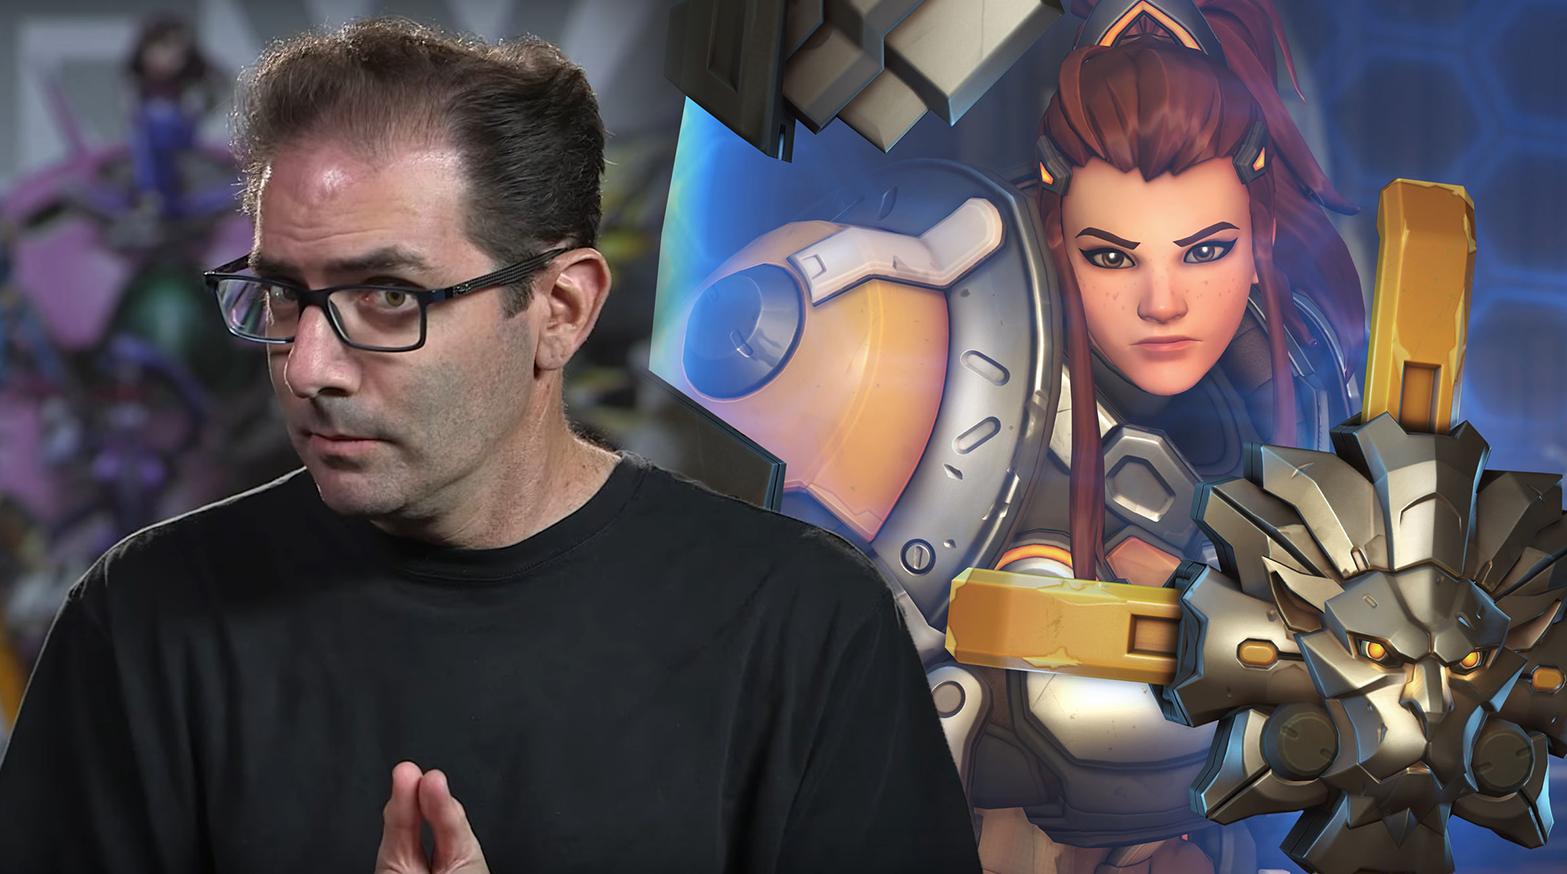 Jeff Kaplan talking to camera / Overwatch hero Brigitte in game